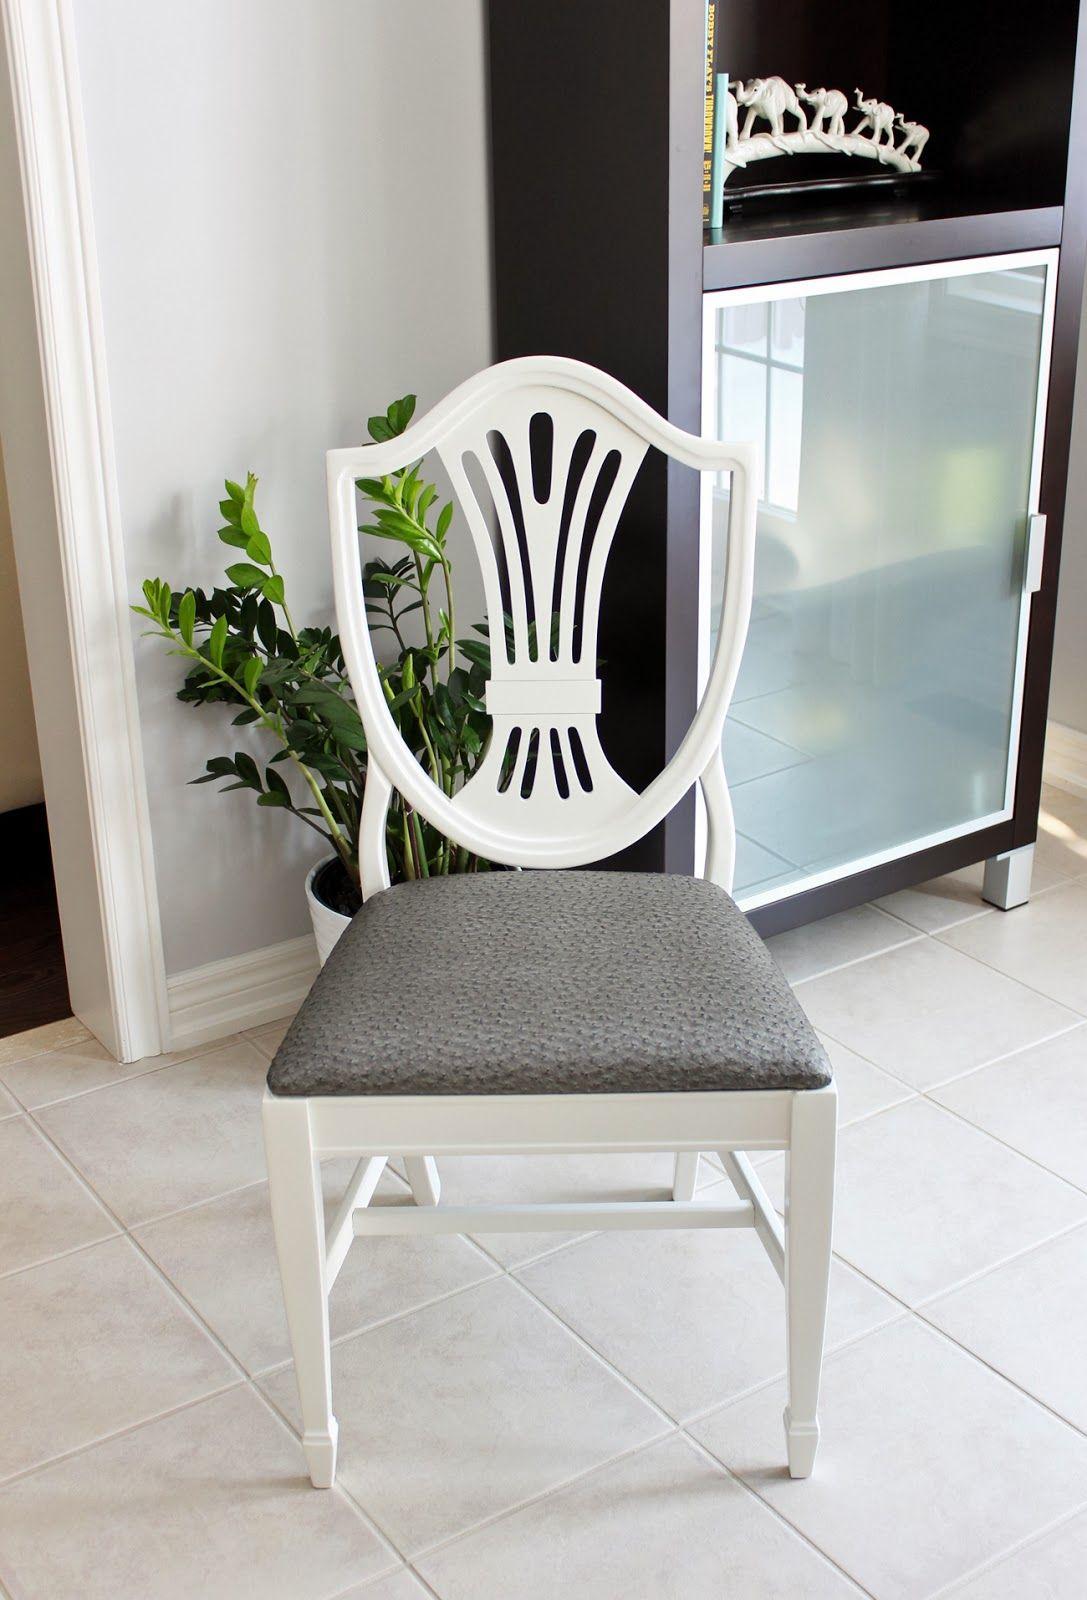 AM Dolce Vita: Antique Shield Back Chair Transformation #makeover #ostrich - AM Dolce Vita: Antique Shield Back Chair Transformation #makeover